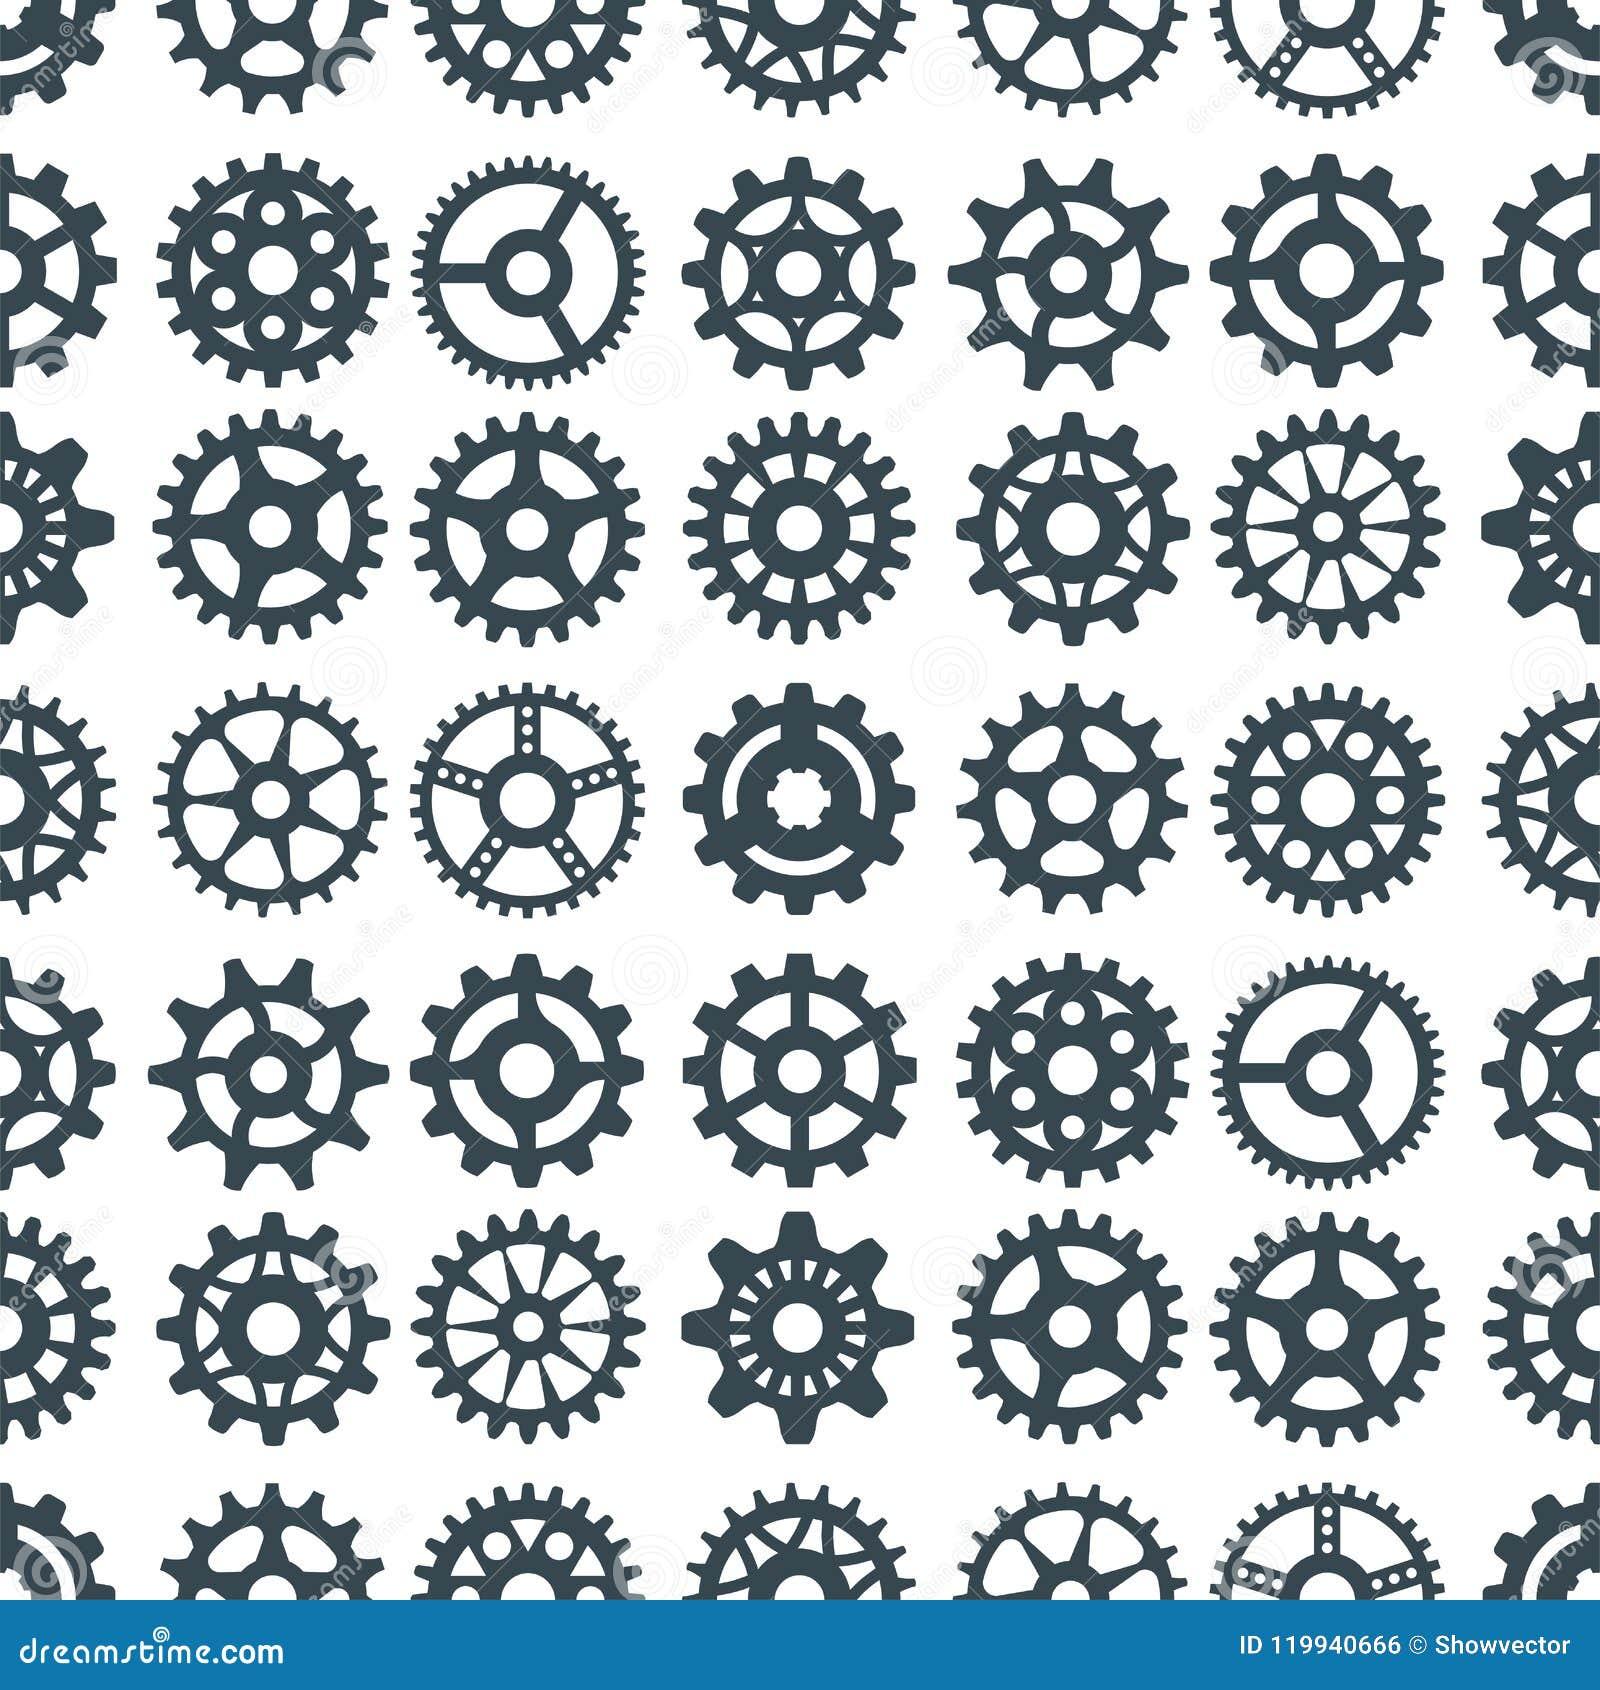 Gear vector illustration mechanics gearing web development shape work cog engine wheel equipment machinery seamless